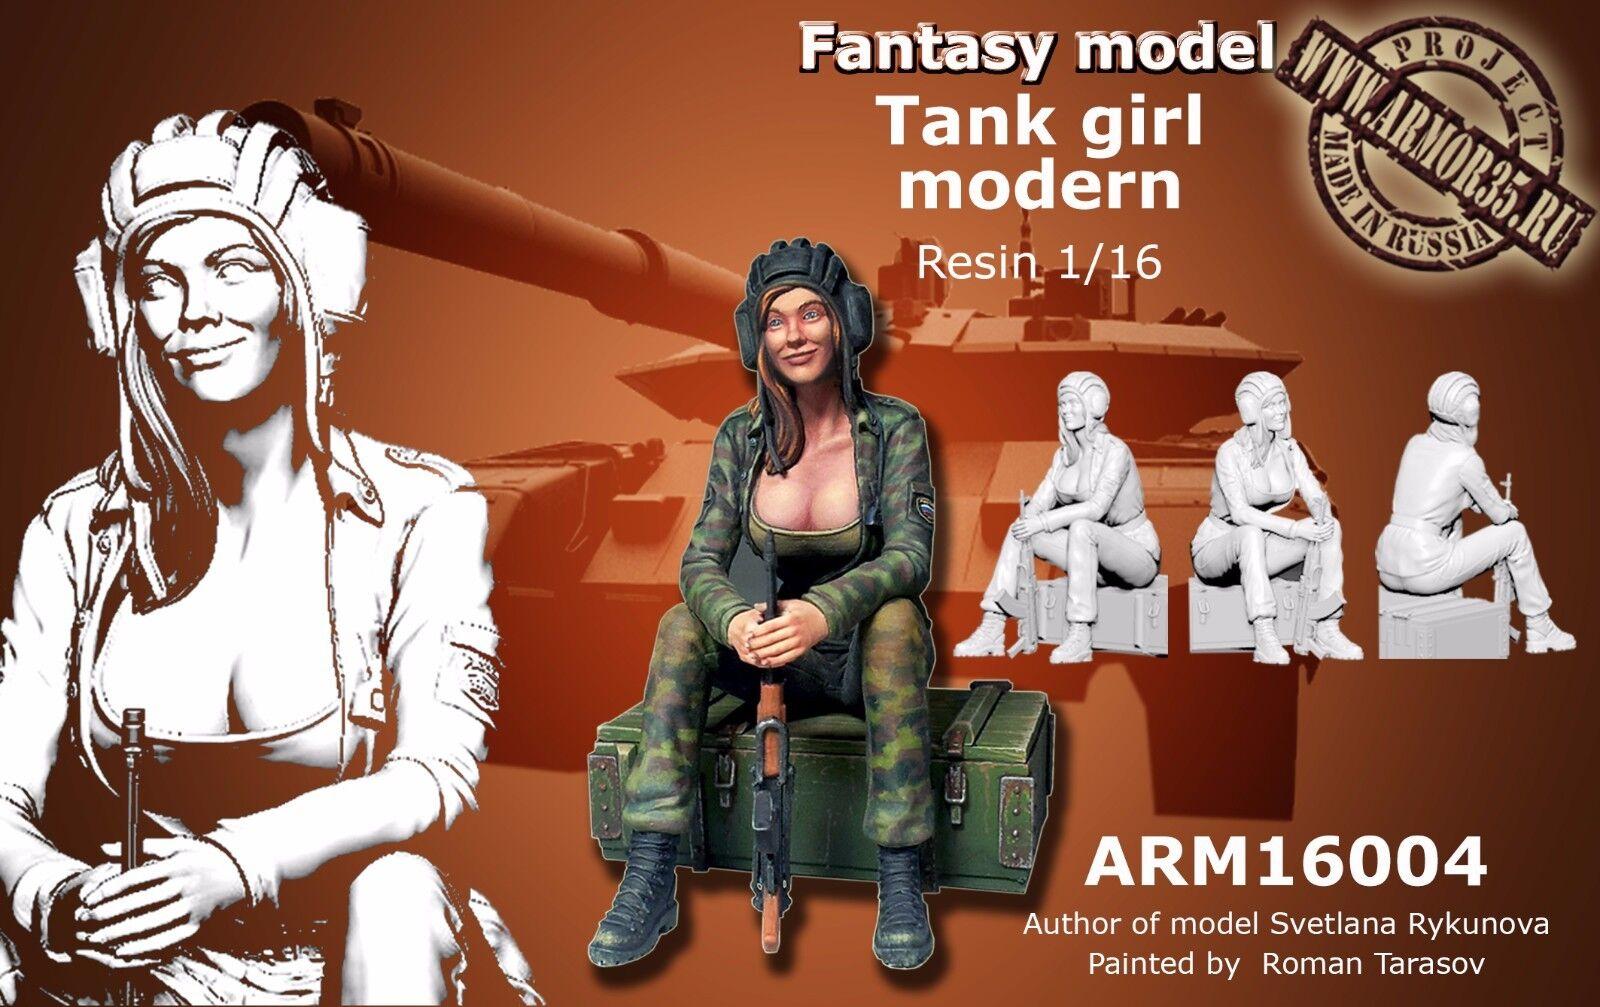 ARMOR35 16004 MODERN TANK GIRL RESIN SCALE MODEL FIGURE 1 16 NEW